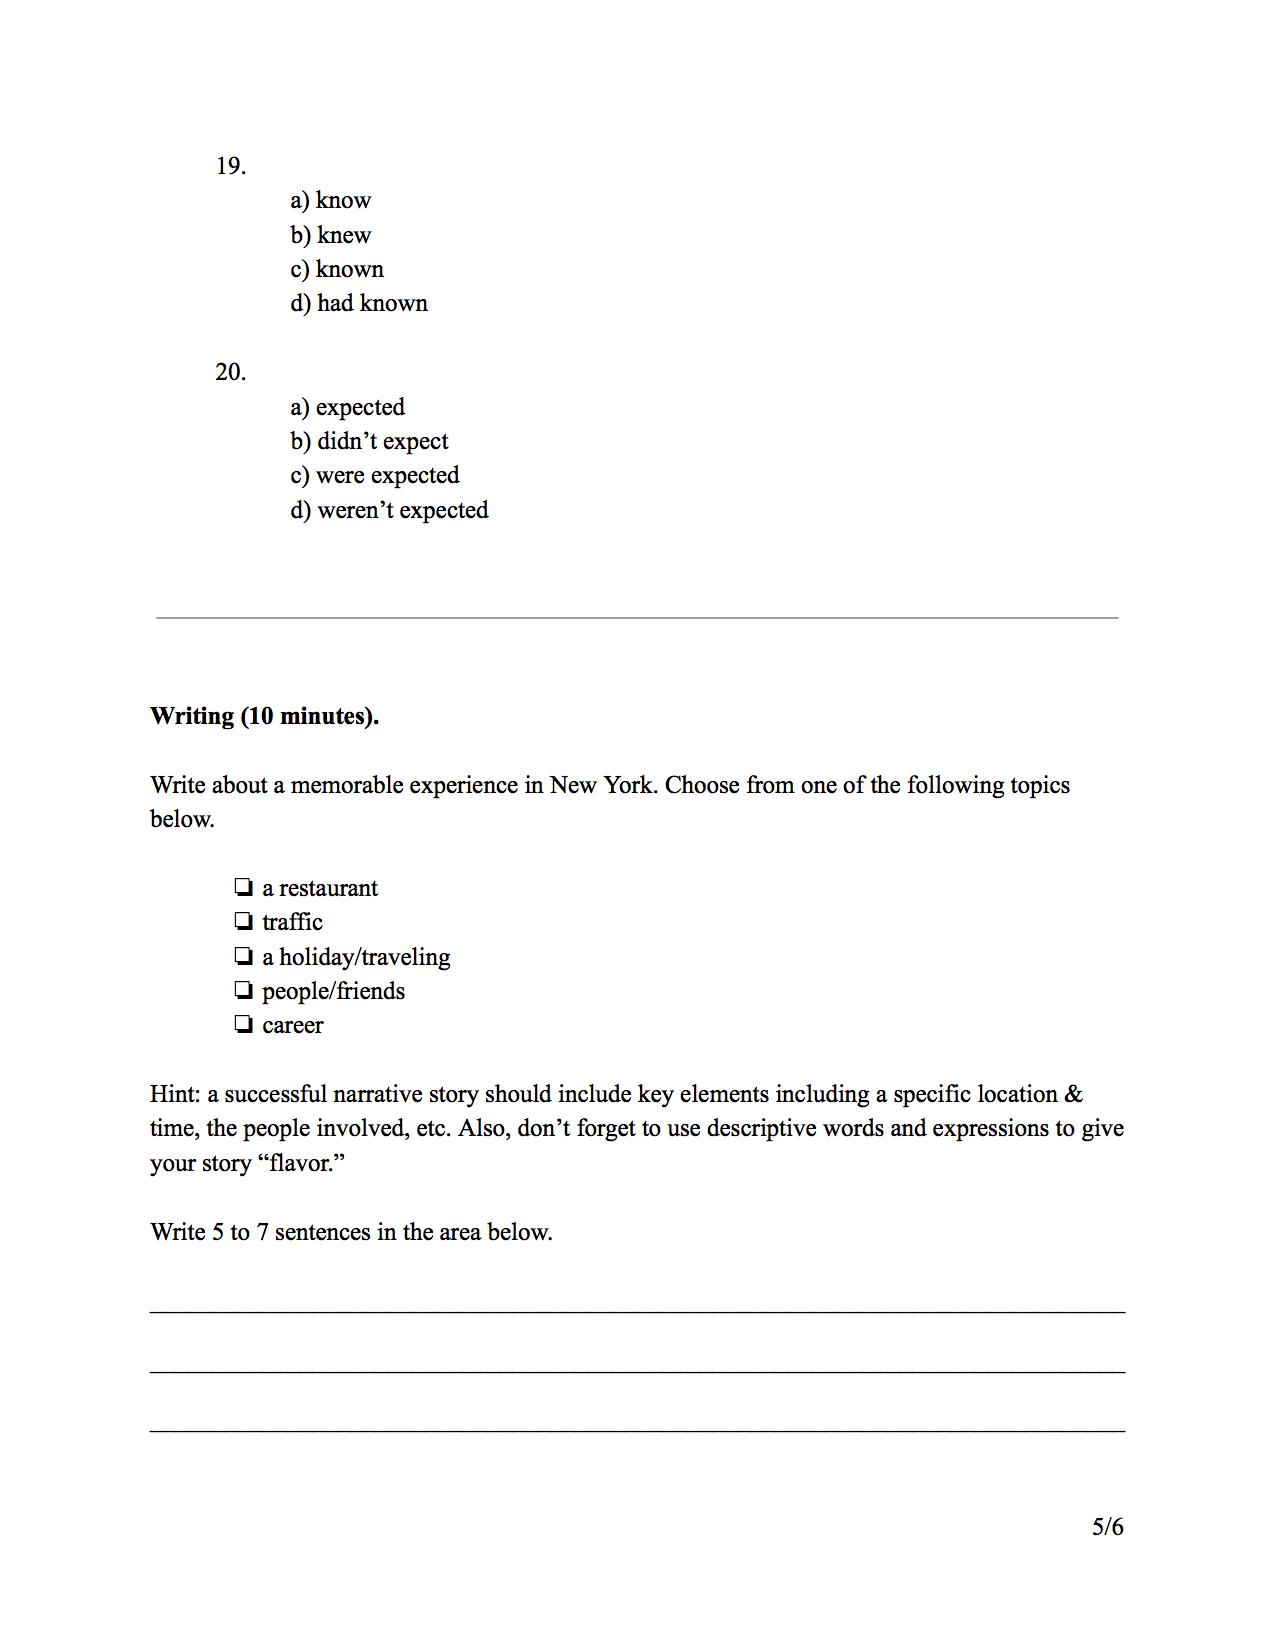 test page five.jpg